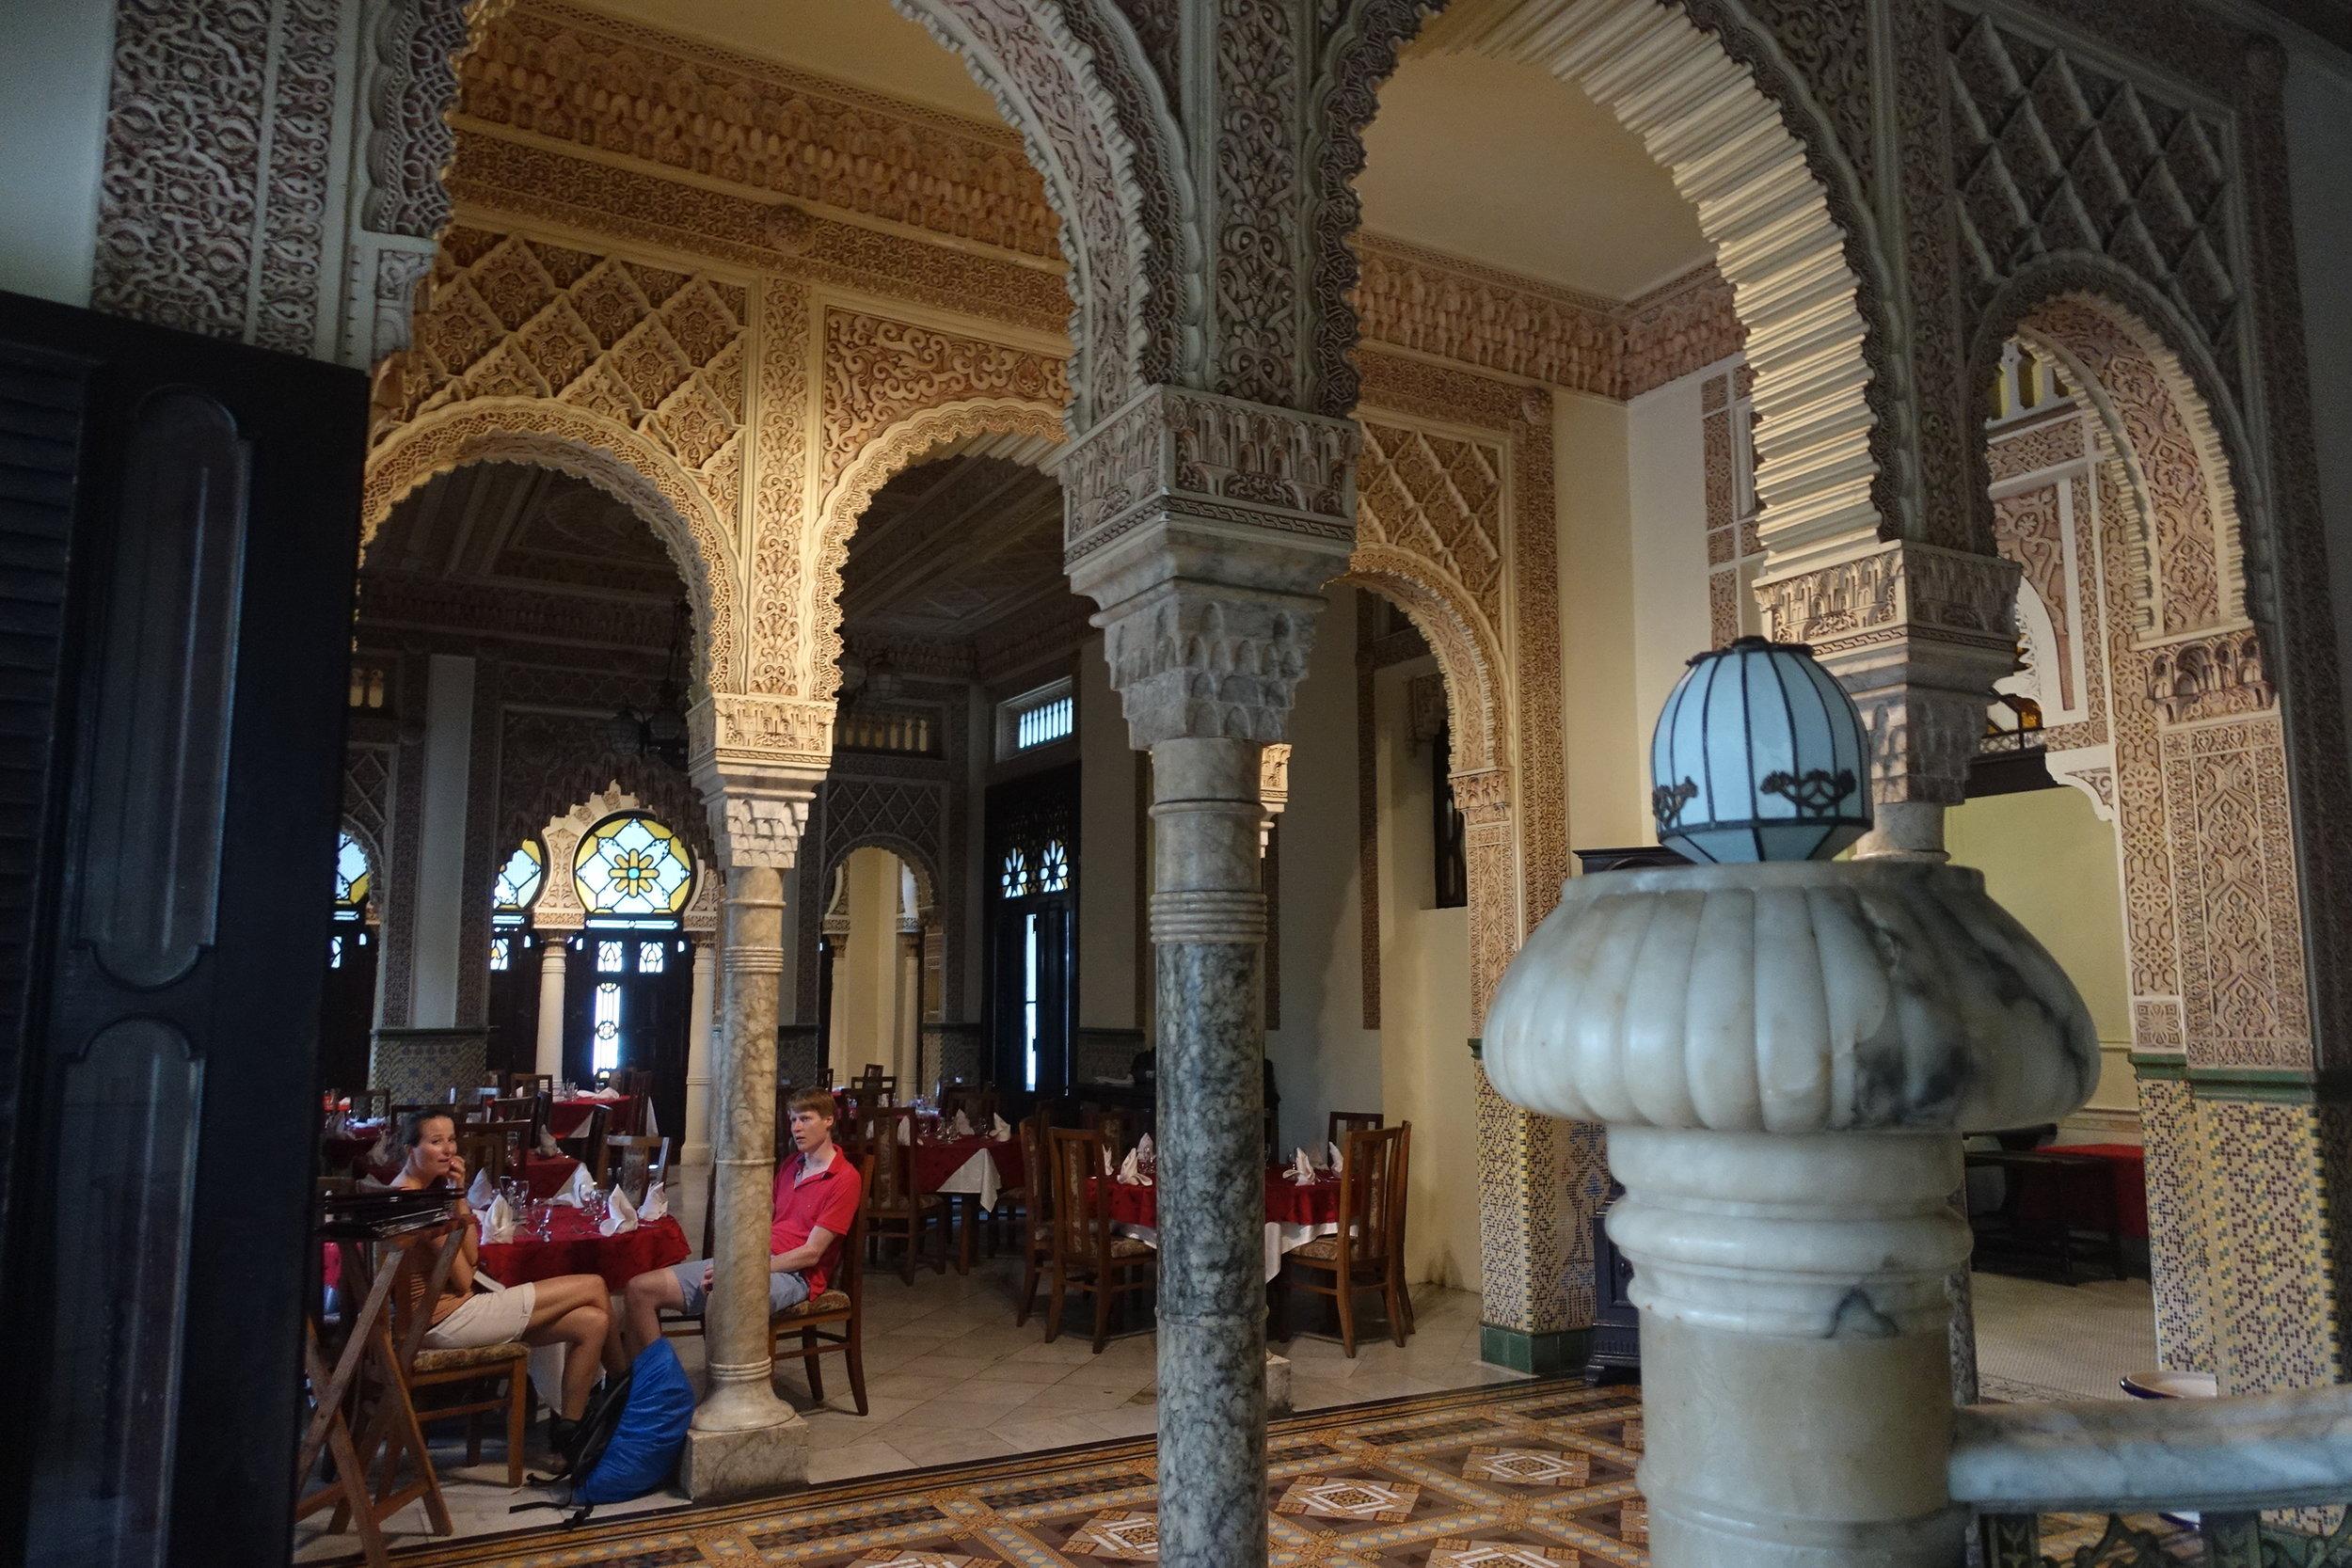 inside the strangely arabesque palacio de valle